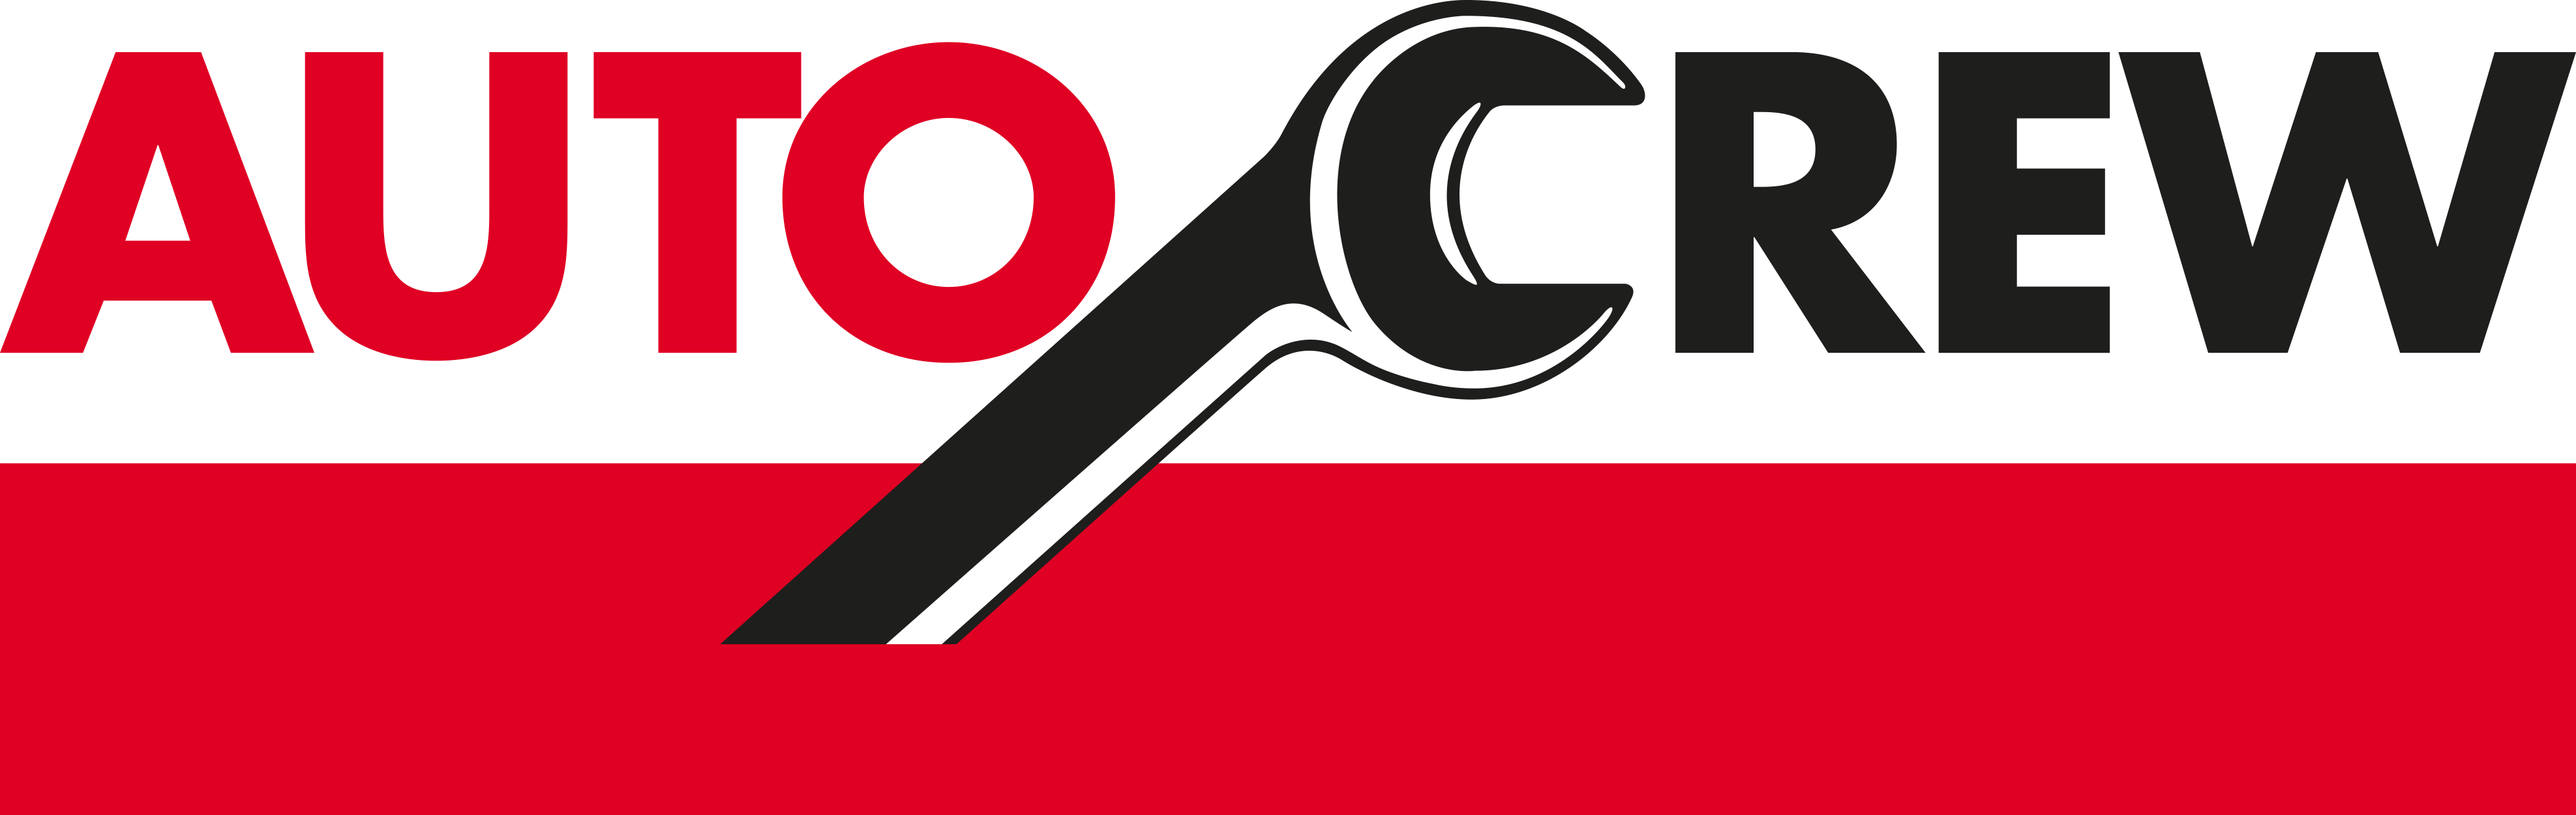 AutoCrew-logo-HD_0_0